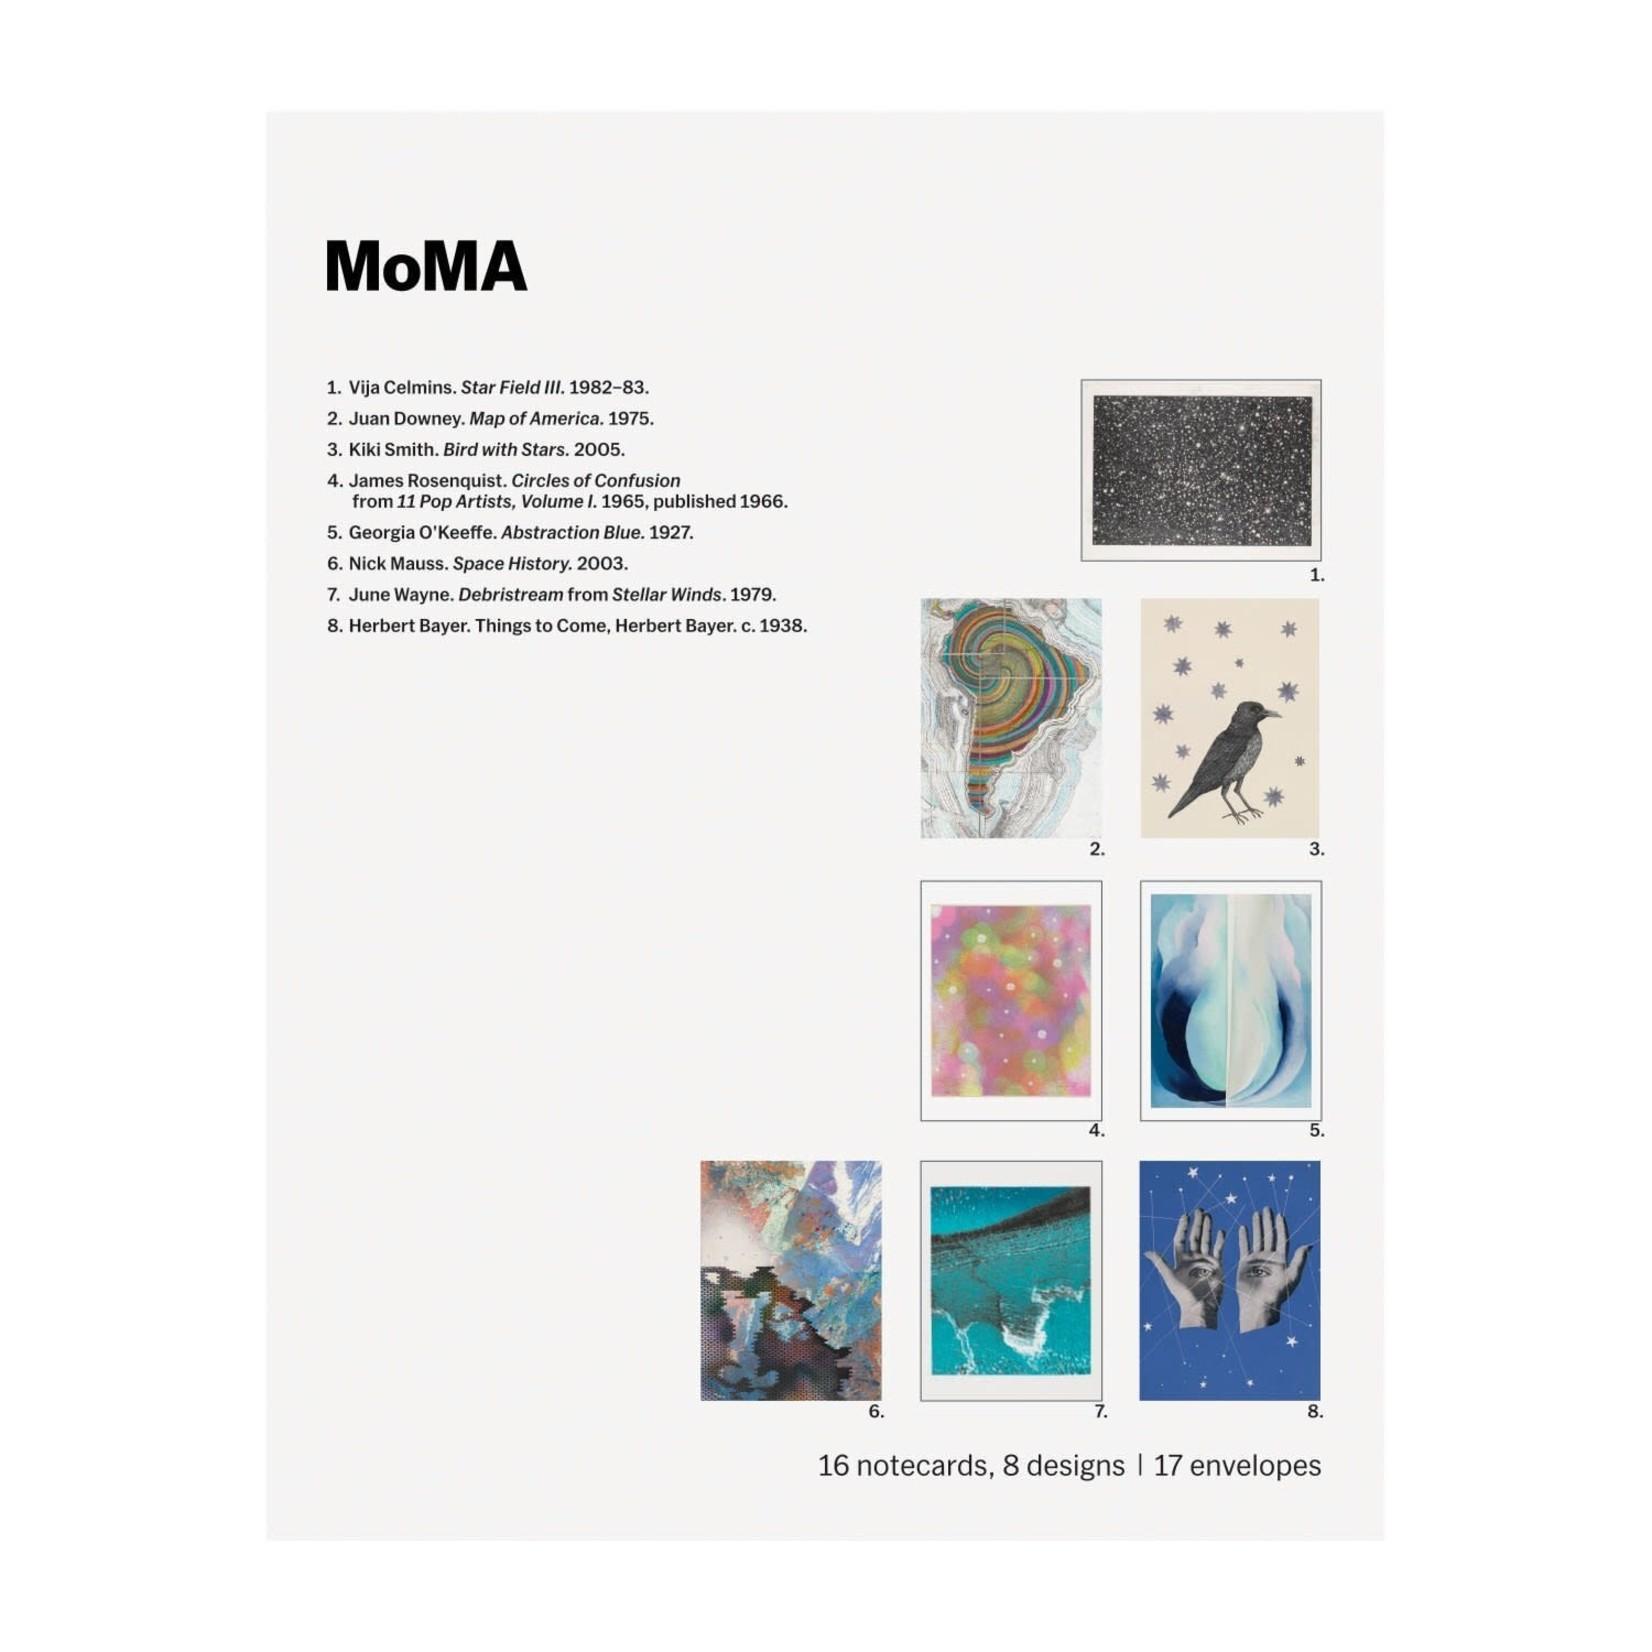 MoMa Notecards